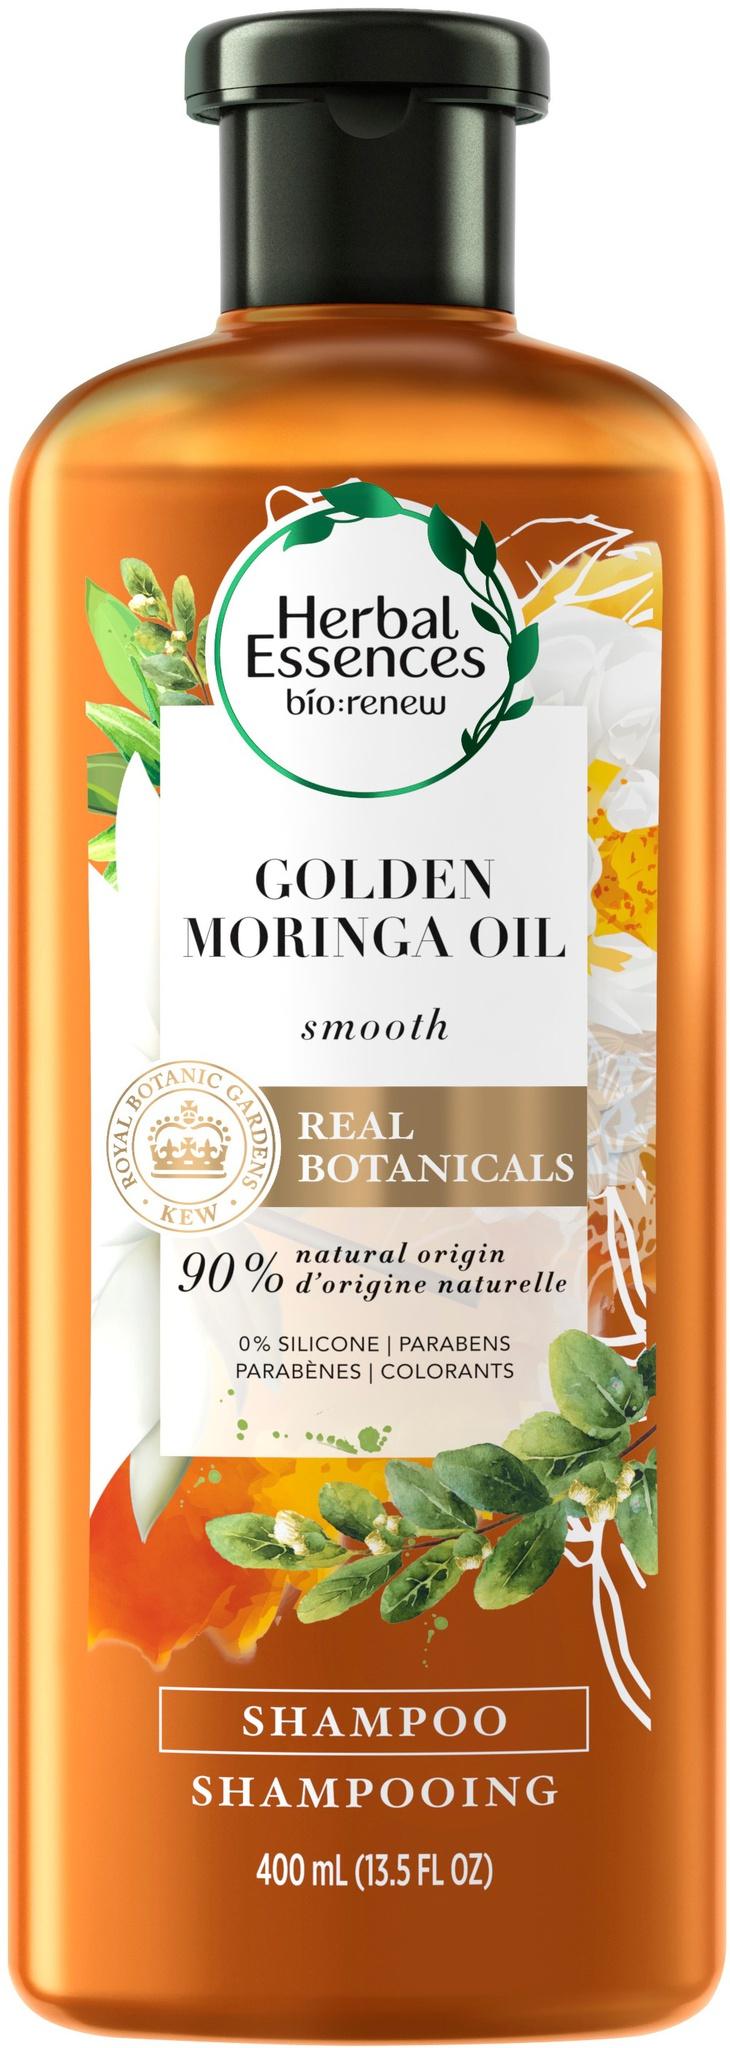 Herbal Essences Golden Moringa Oil Smoothing Shampoo